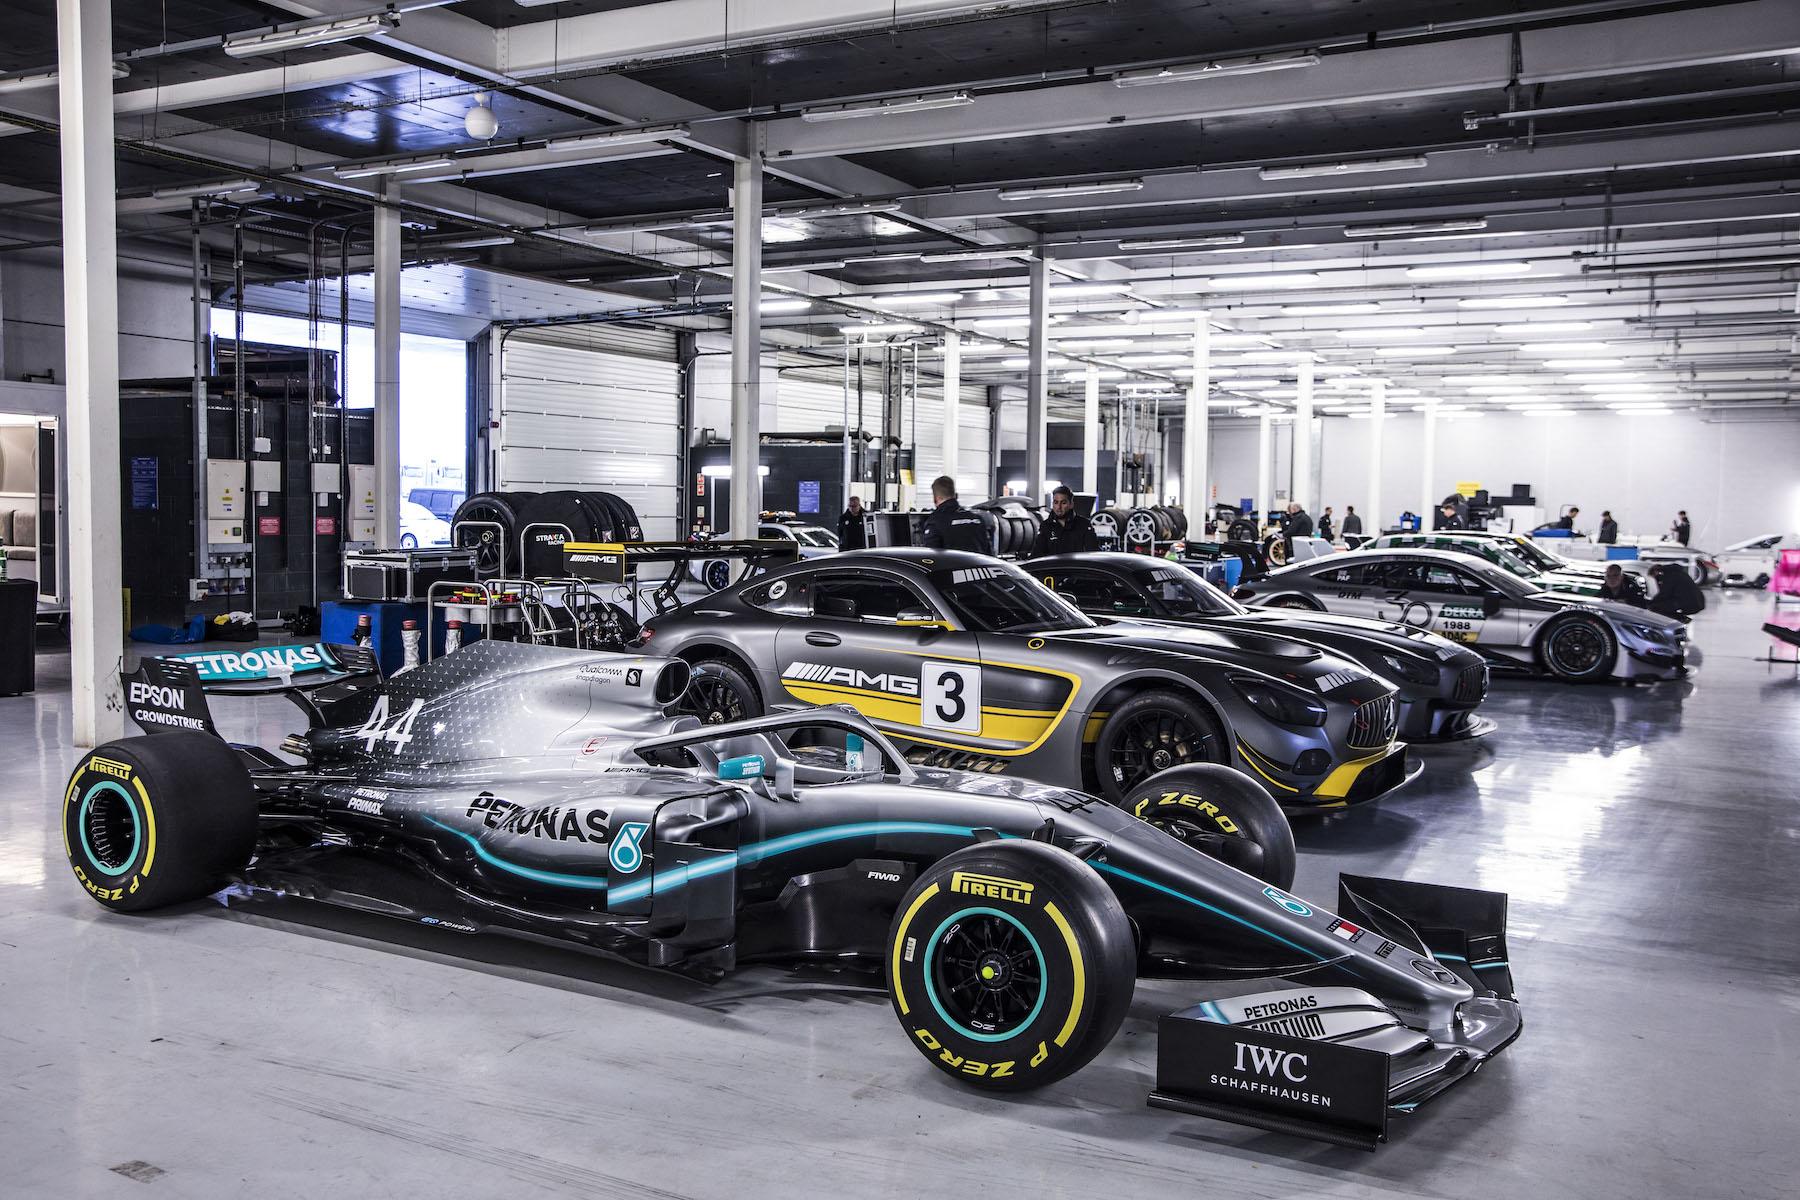 2019 Mercedes 125 years in Motorsports celebration | 2019 Silverstone 11.jpg